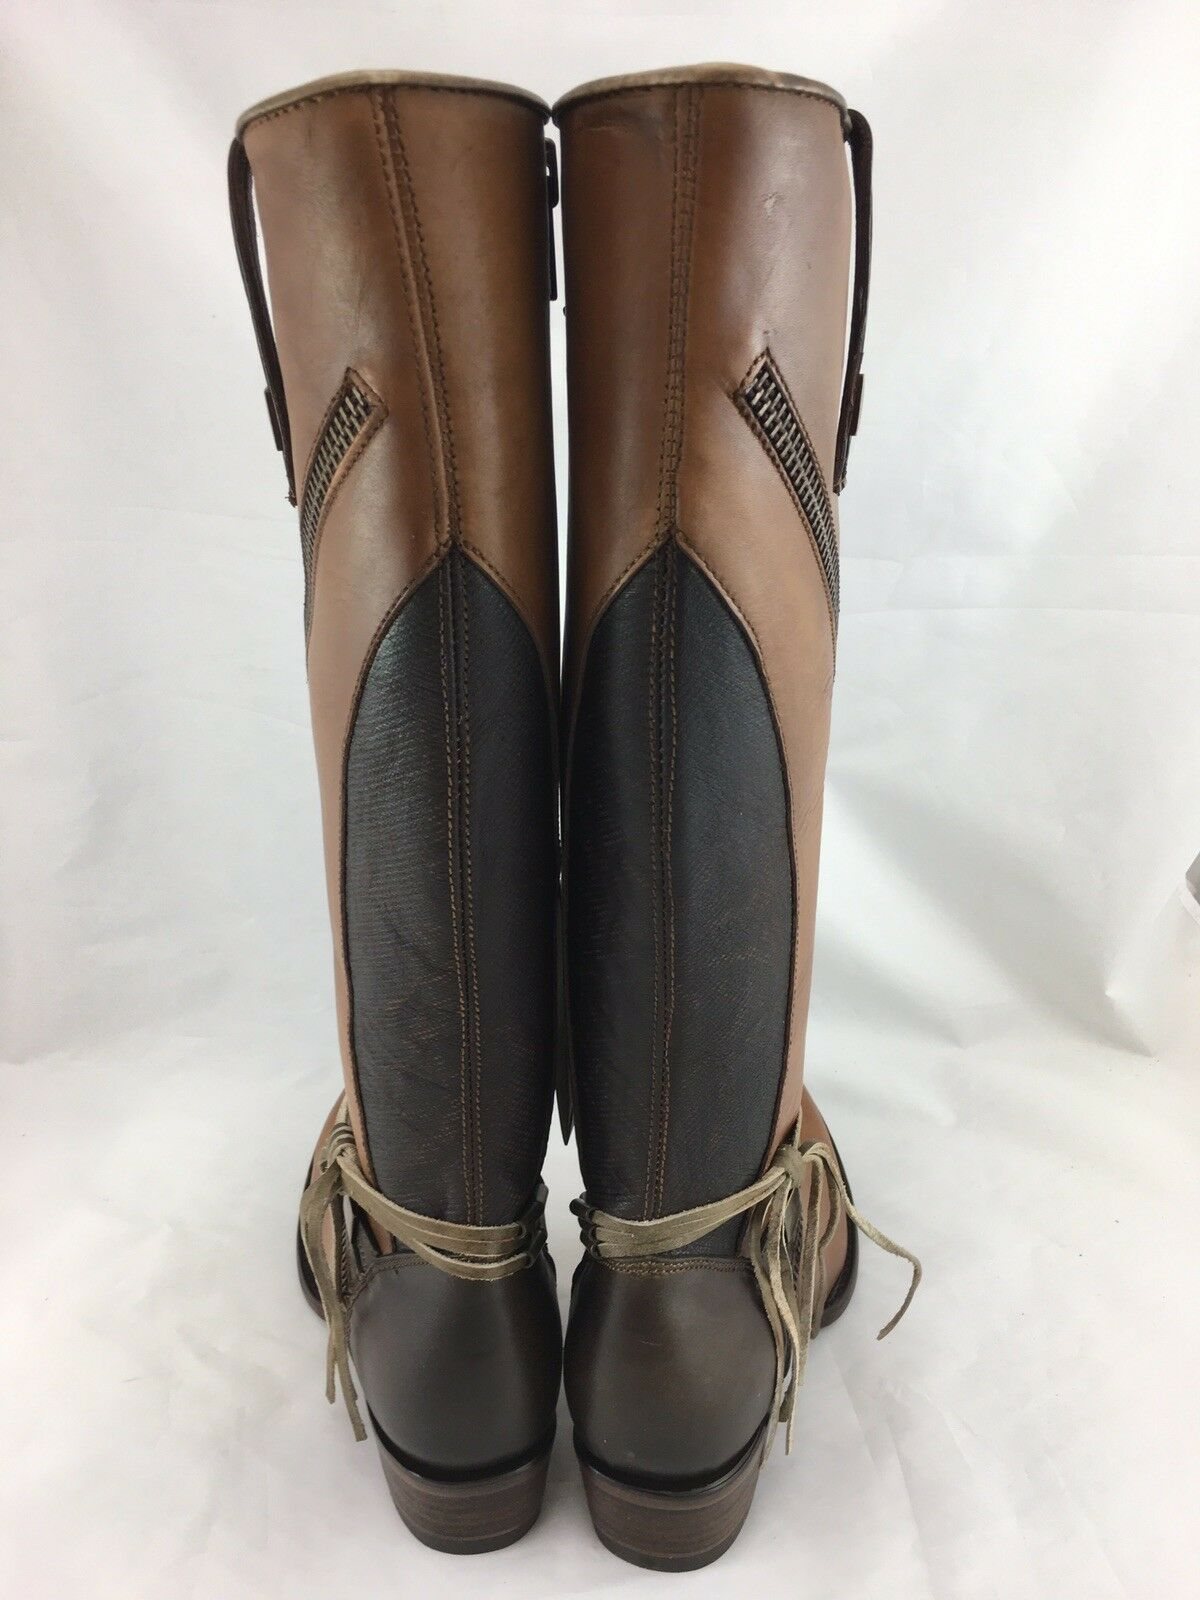 e05380e67 ... Cuadra femmes 7.5 US Crust Wax Nuez Nuez Nuez Tall Leather bottes  1X50CS marron New d9e484 ...